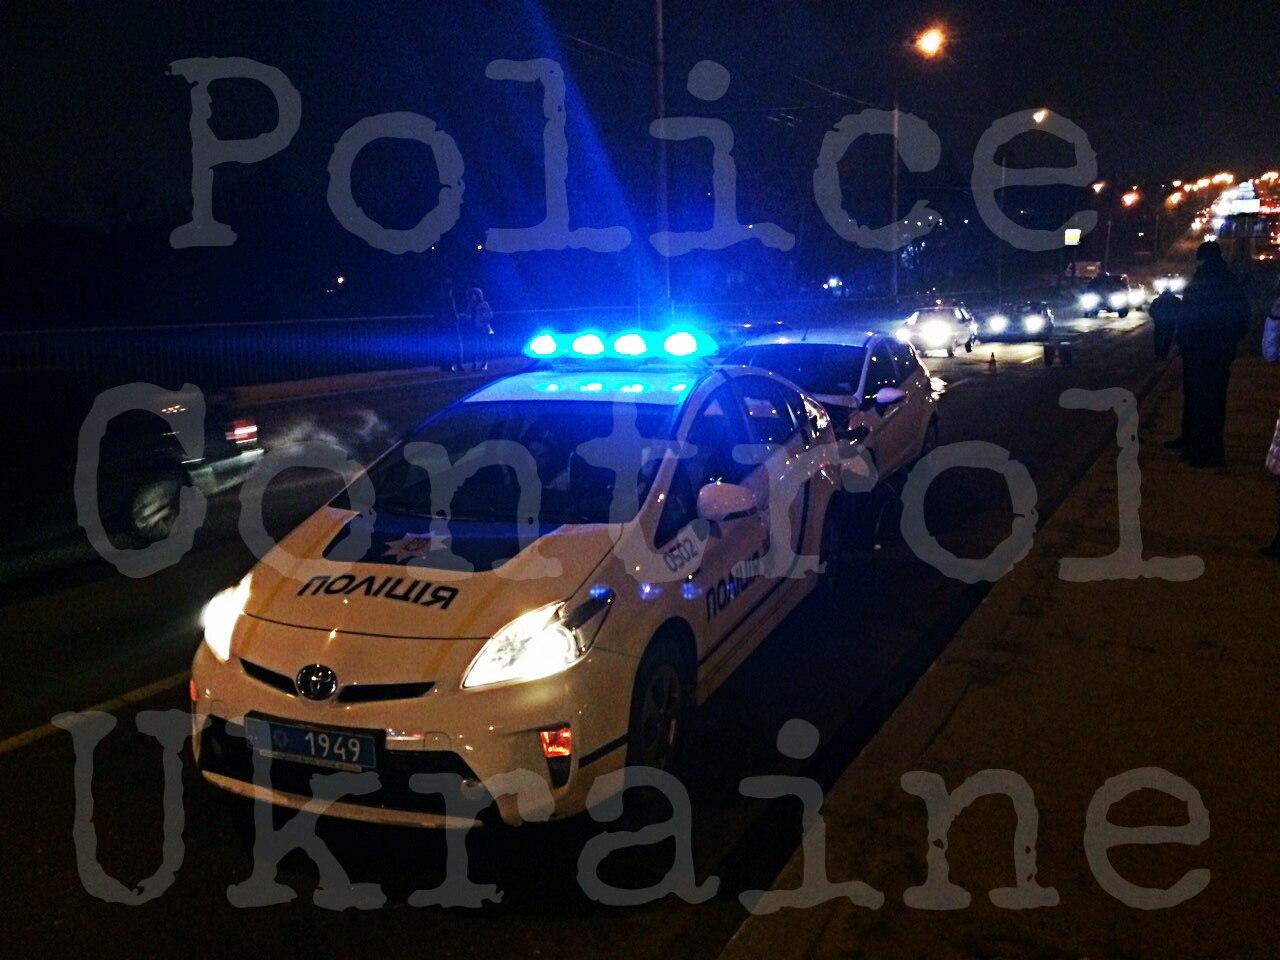 На Салтівці патрульна машина потрапила в ДТП (ФОТО, ВІДЕО) - фото 2